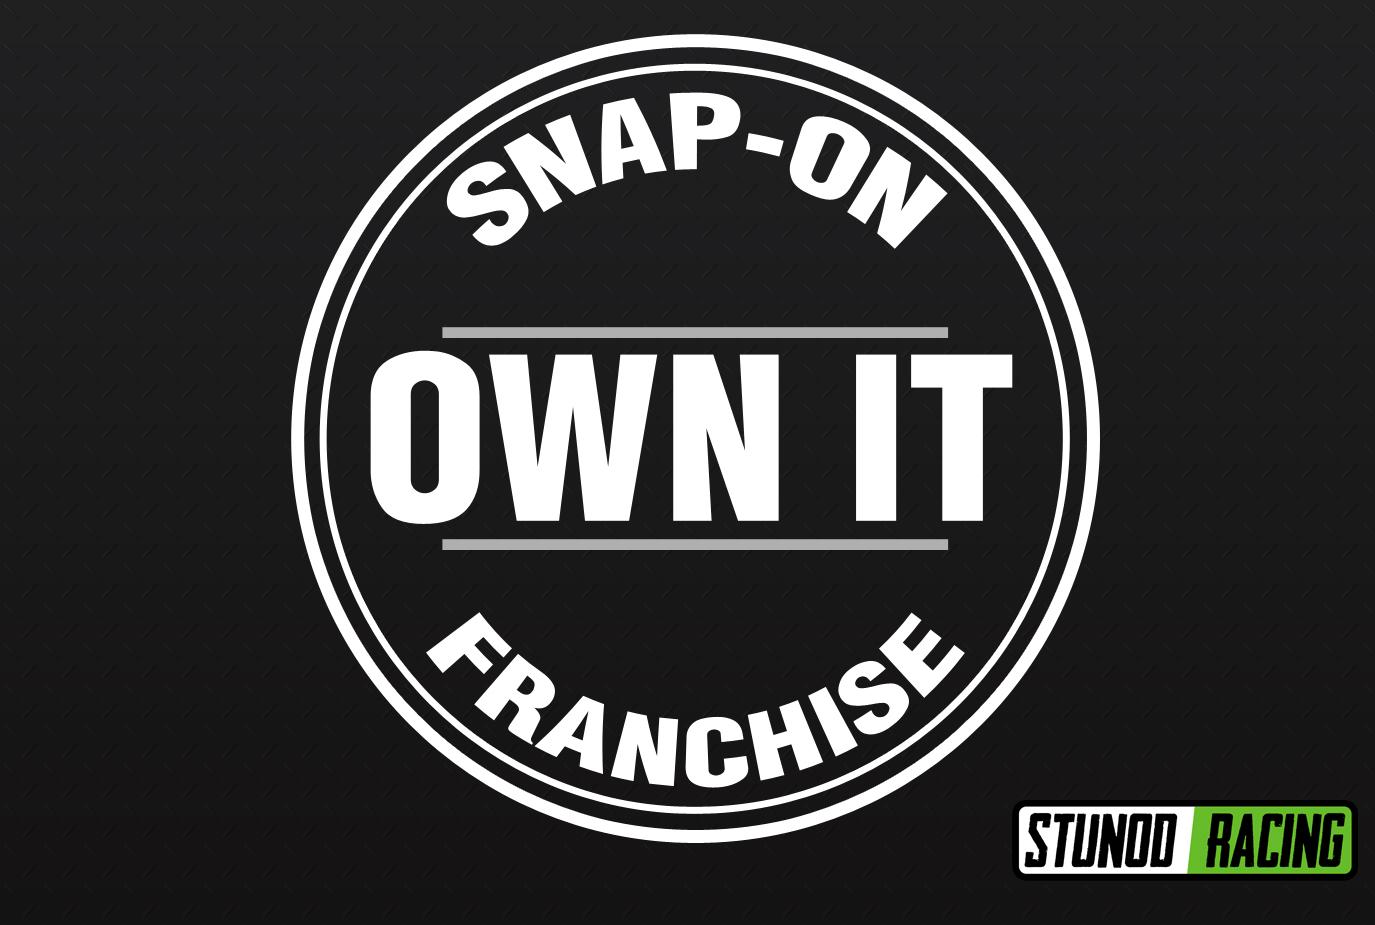 StunodRacing-Snap-On_Own It-Logo.jpg